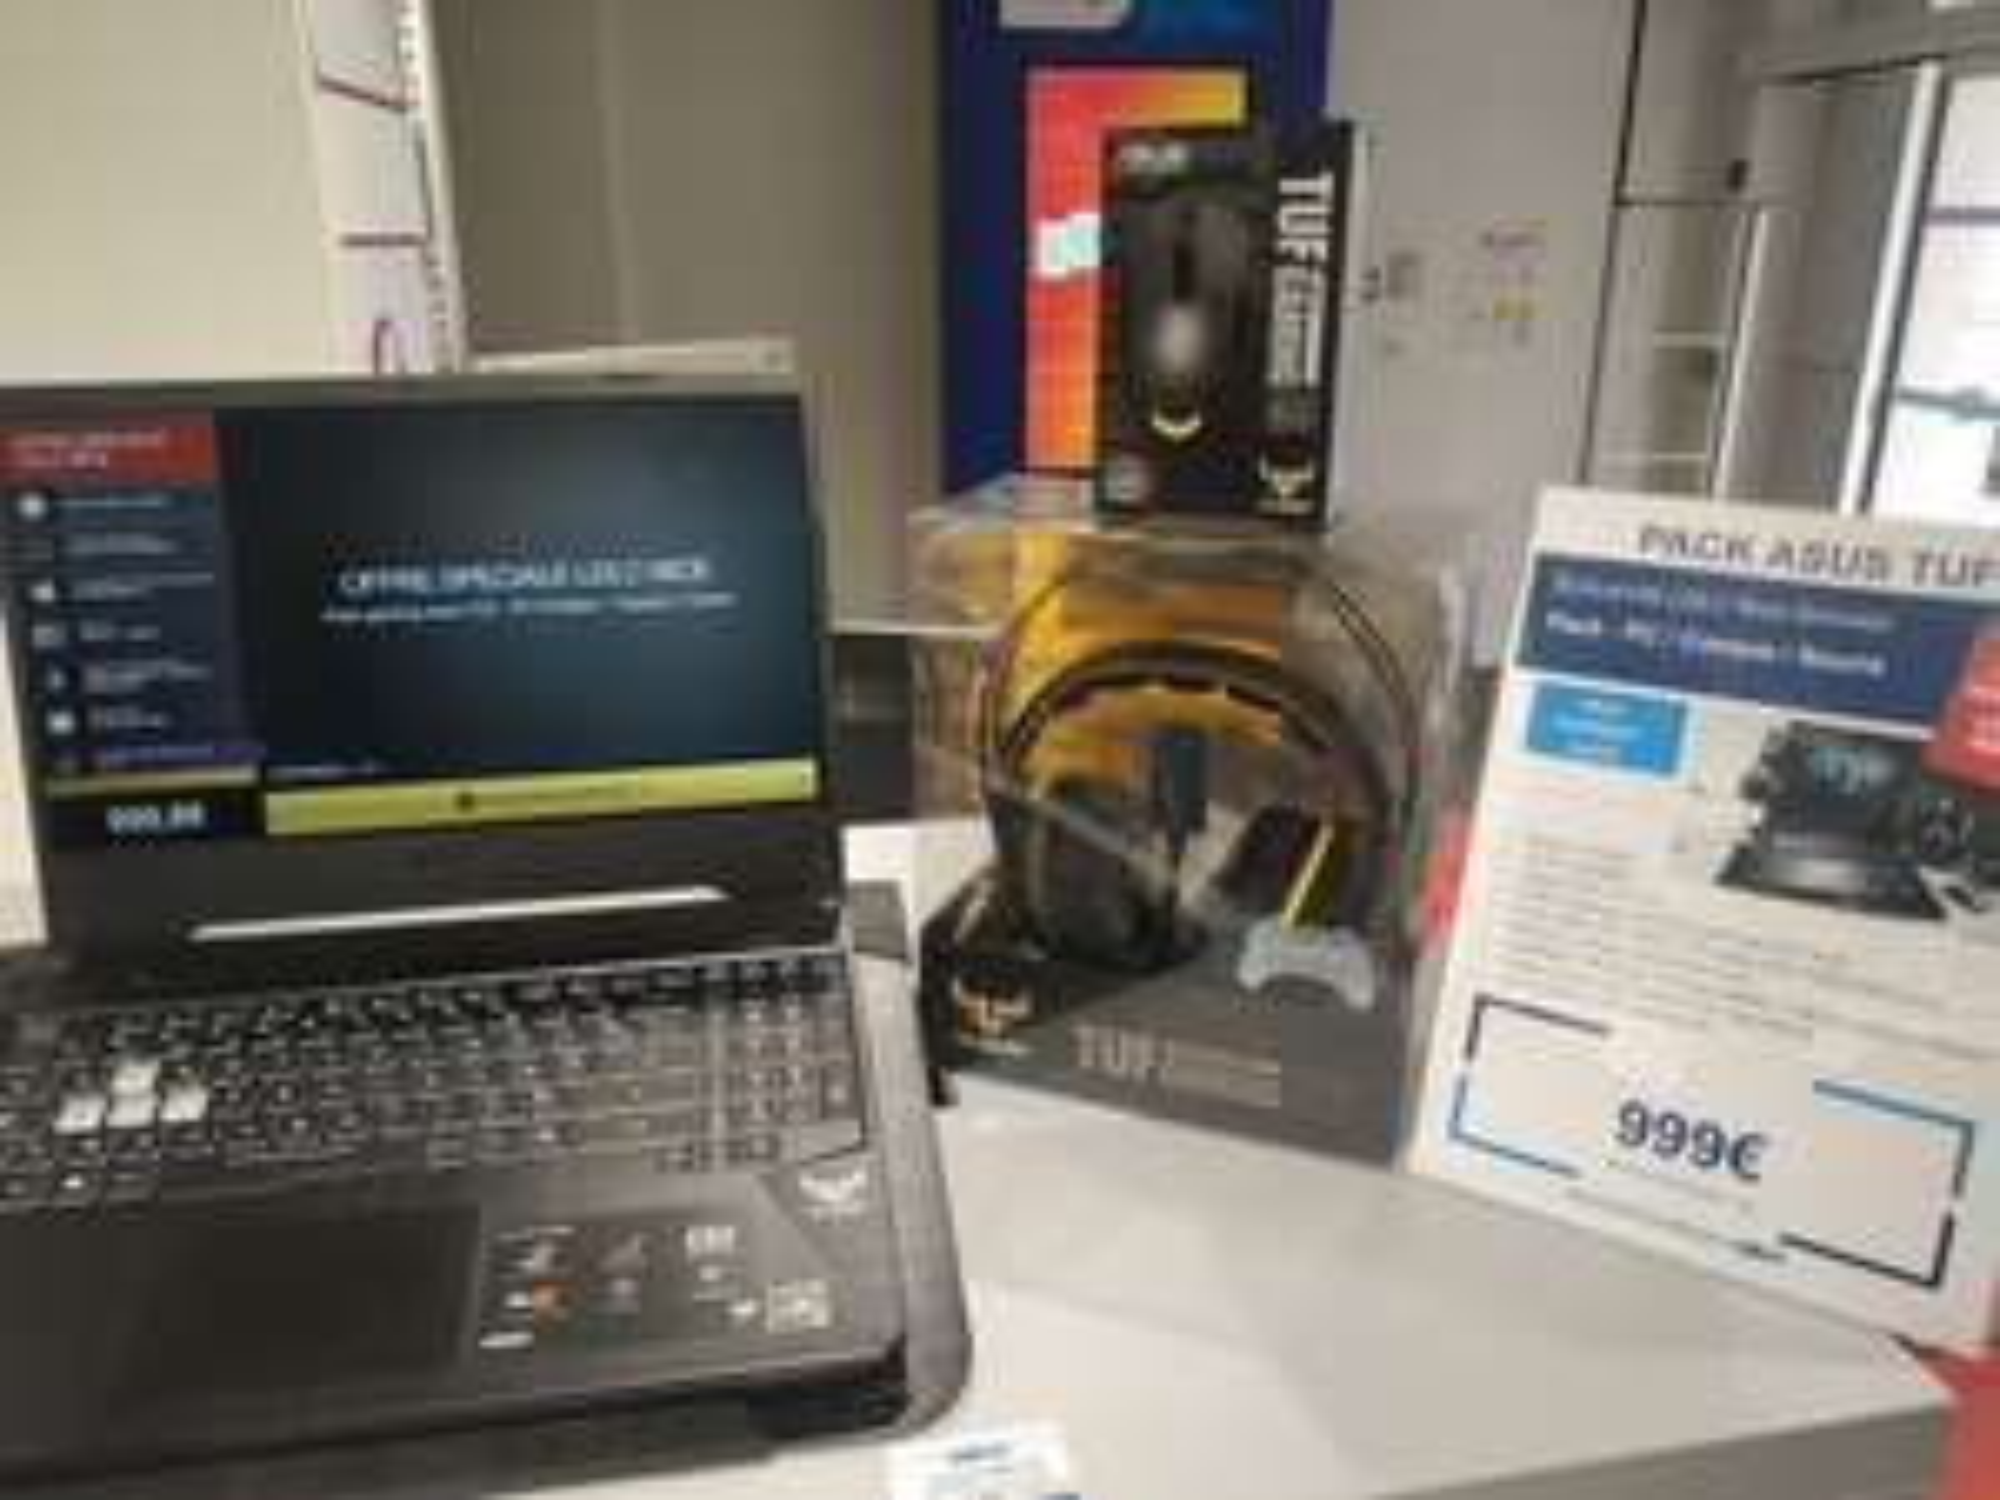 "PC Portable 15.6"" Asus TUF505DT-AL218 - Ryzen 5-3550H, 16Go RAM, SSD 512Go, GTX 1650, 120hz + Casque TUF H3 ou H7 + Souris Tuf M5 (Nice 06)"